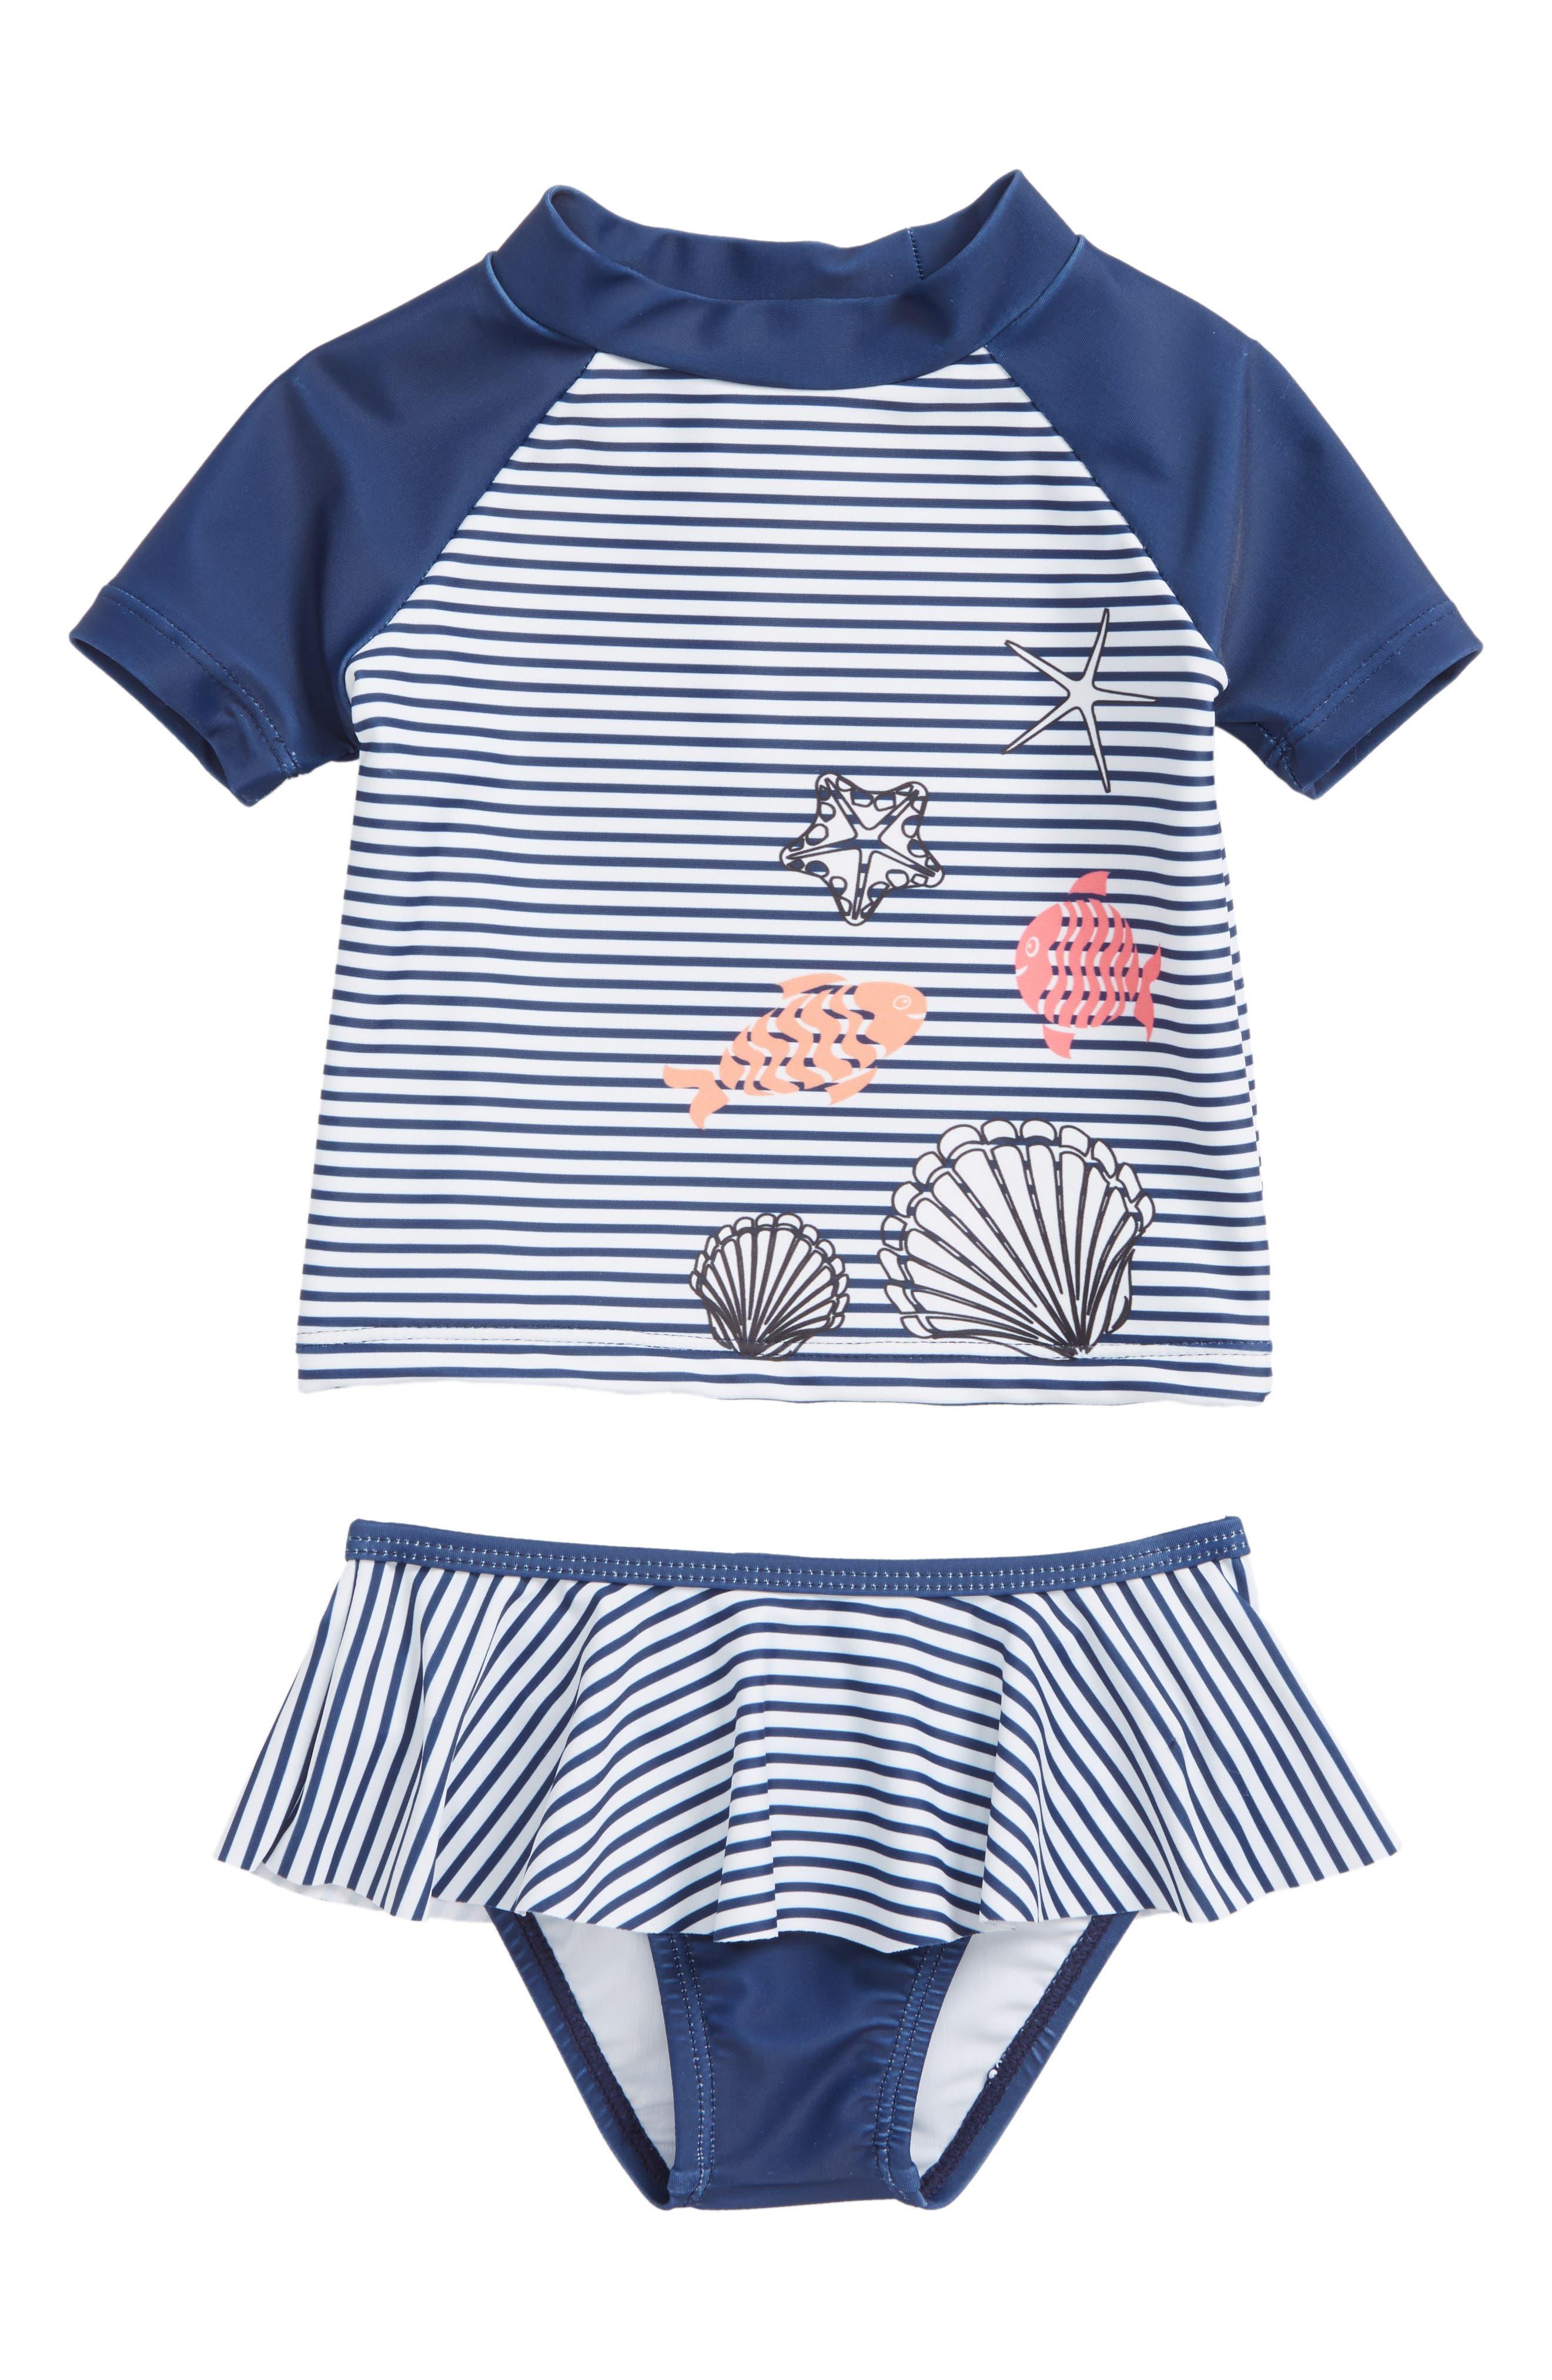 Skirted Two-Piece Rashguard Swimsuit,                         Main,                         color, 410